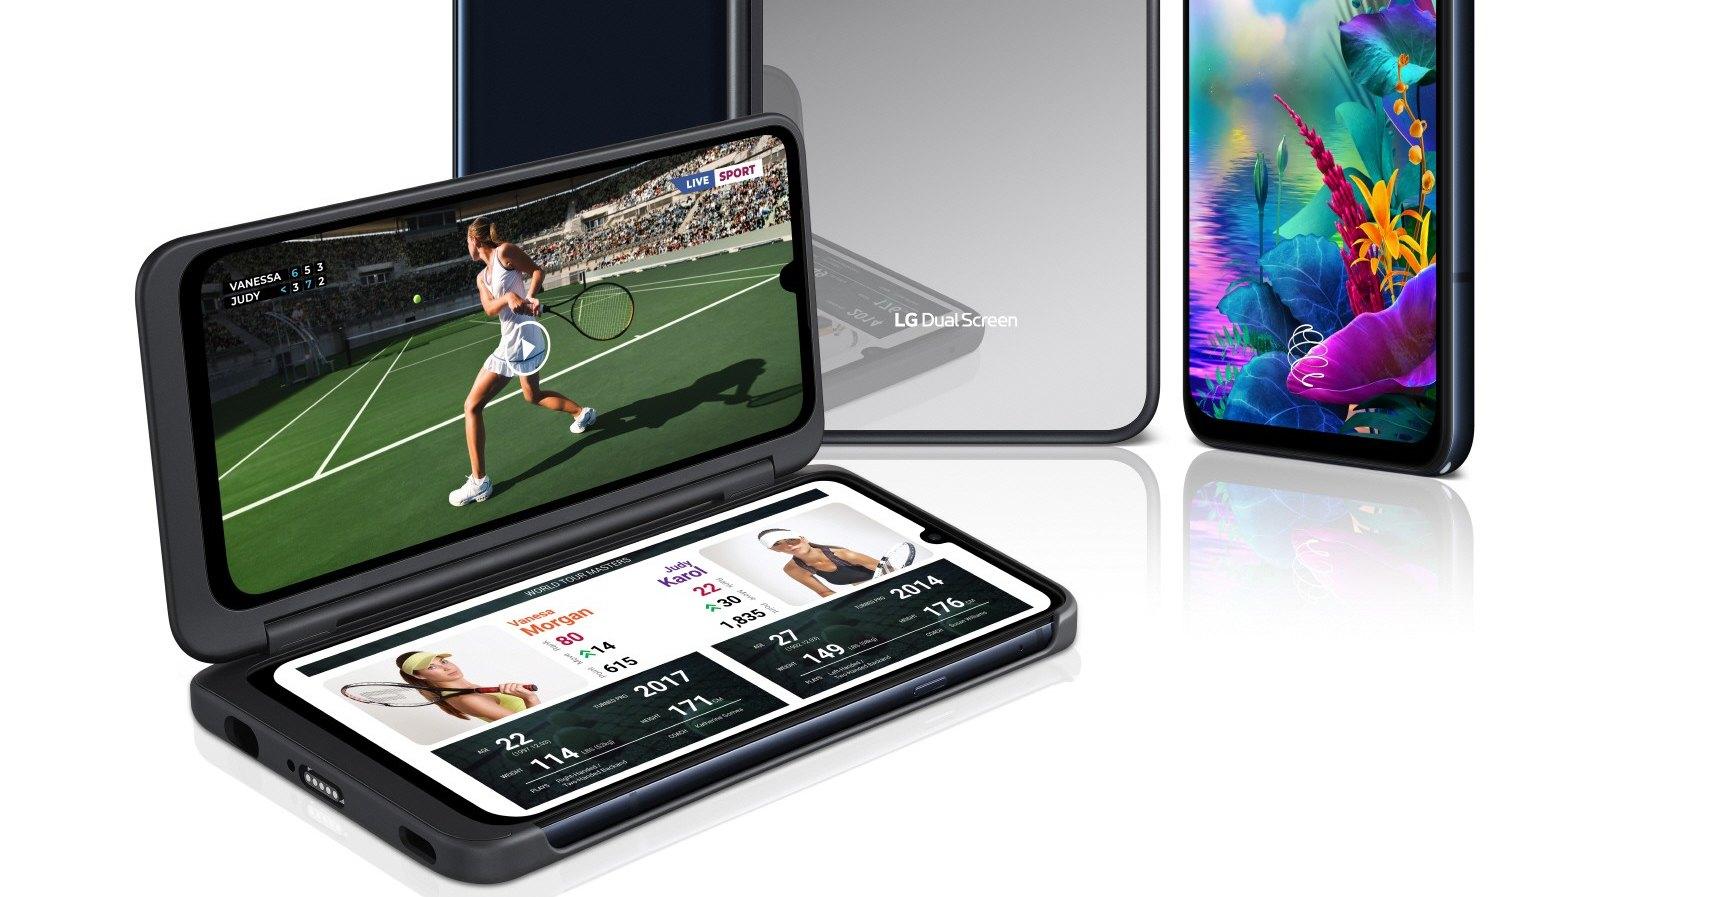 LG представила смартфон с чехлом, добавляющим ему два экрана